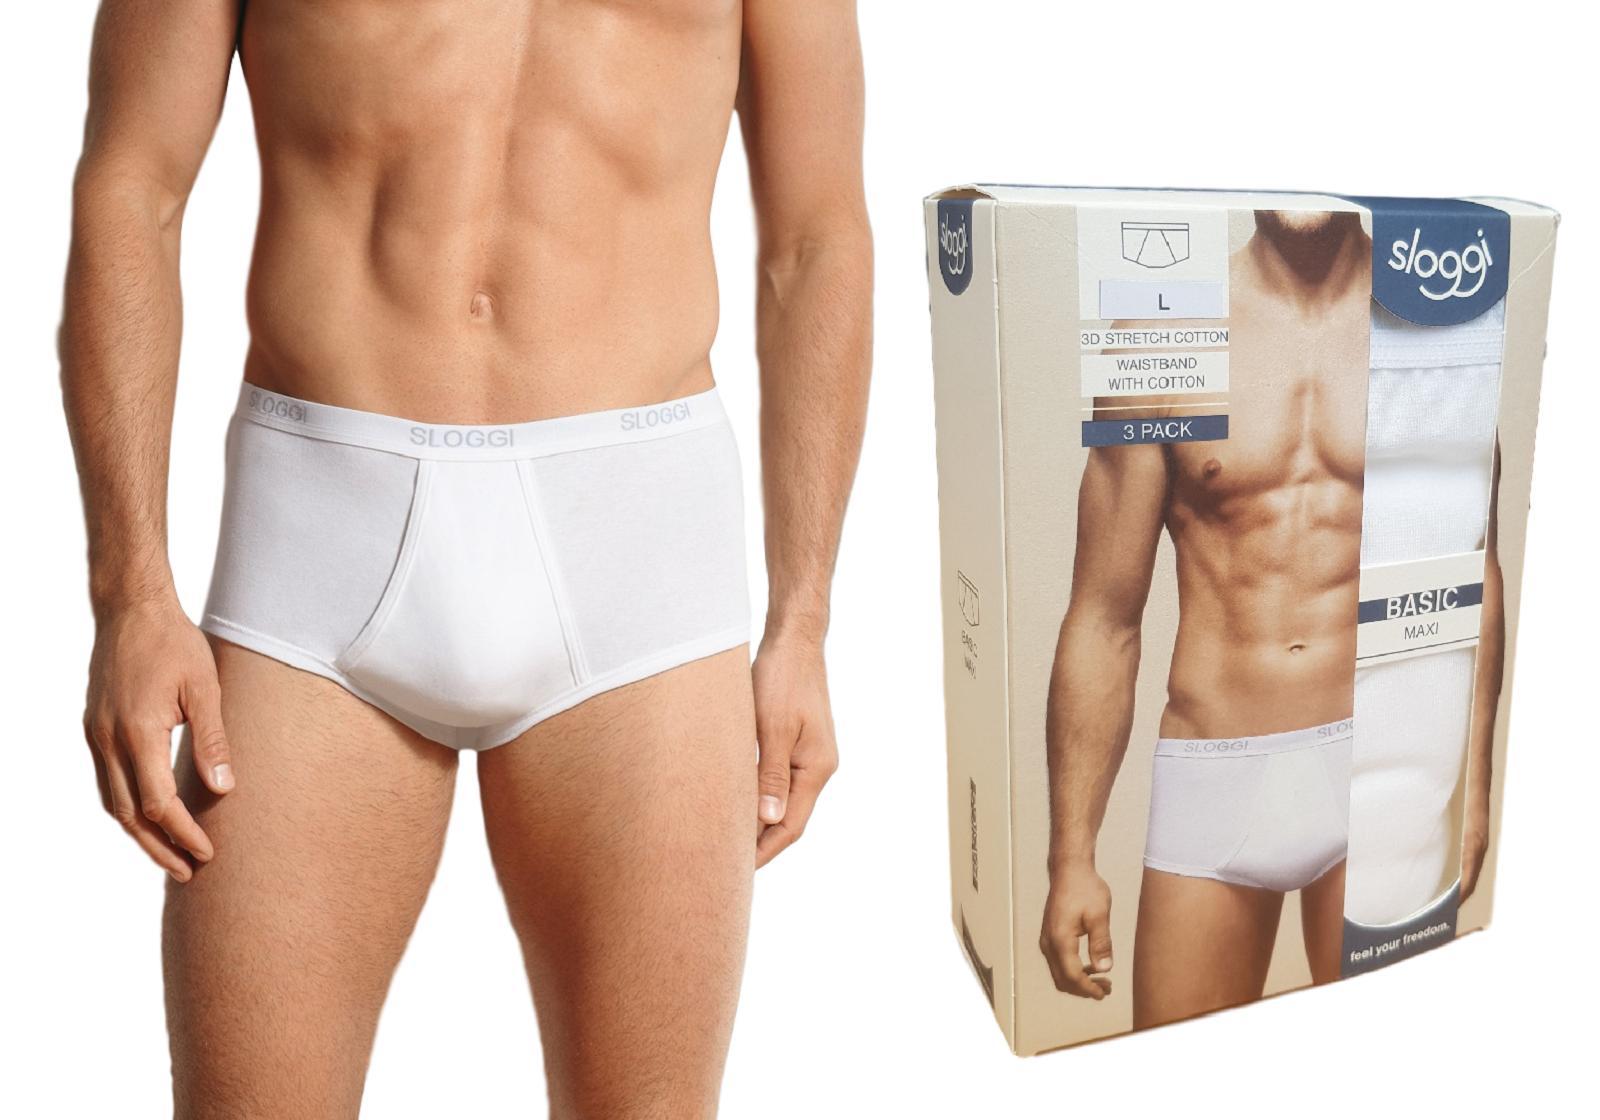 Slip Uomo 3 pezzi BASIC MAXI Strech Cotton elastico esterno SLOGGI Intimo 3-Pack